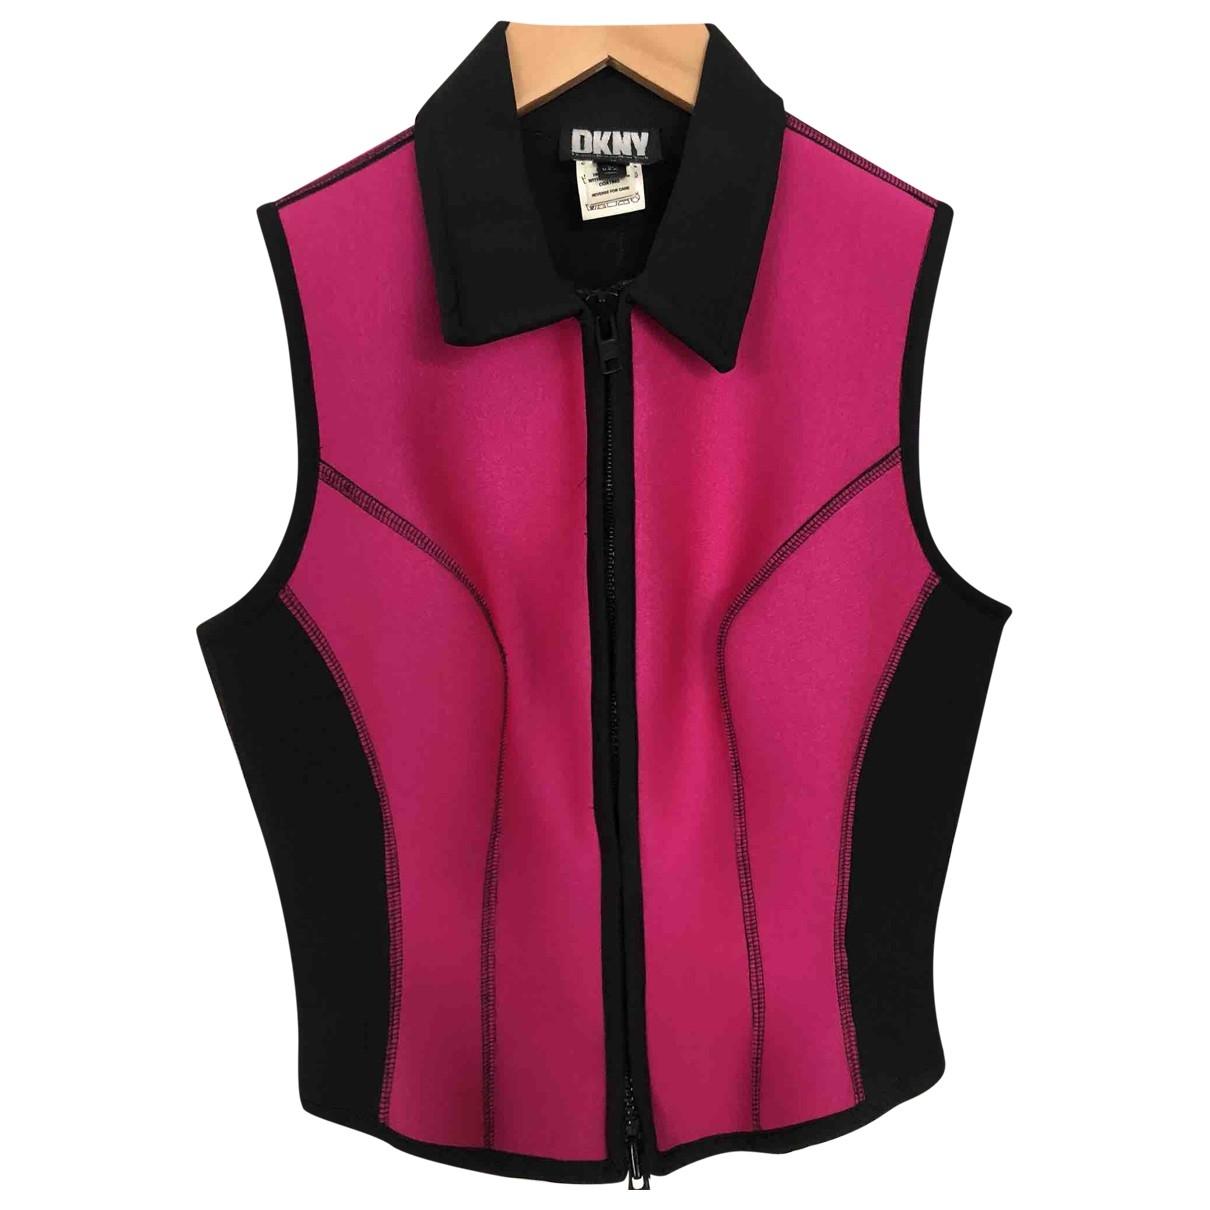 Donna Karan \N Pink  top for Women L International